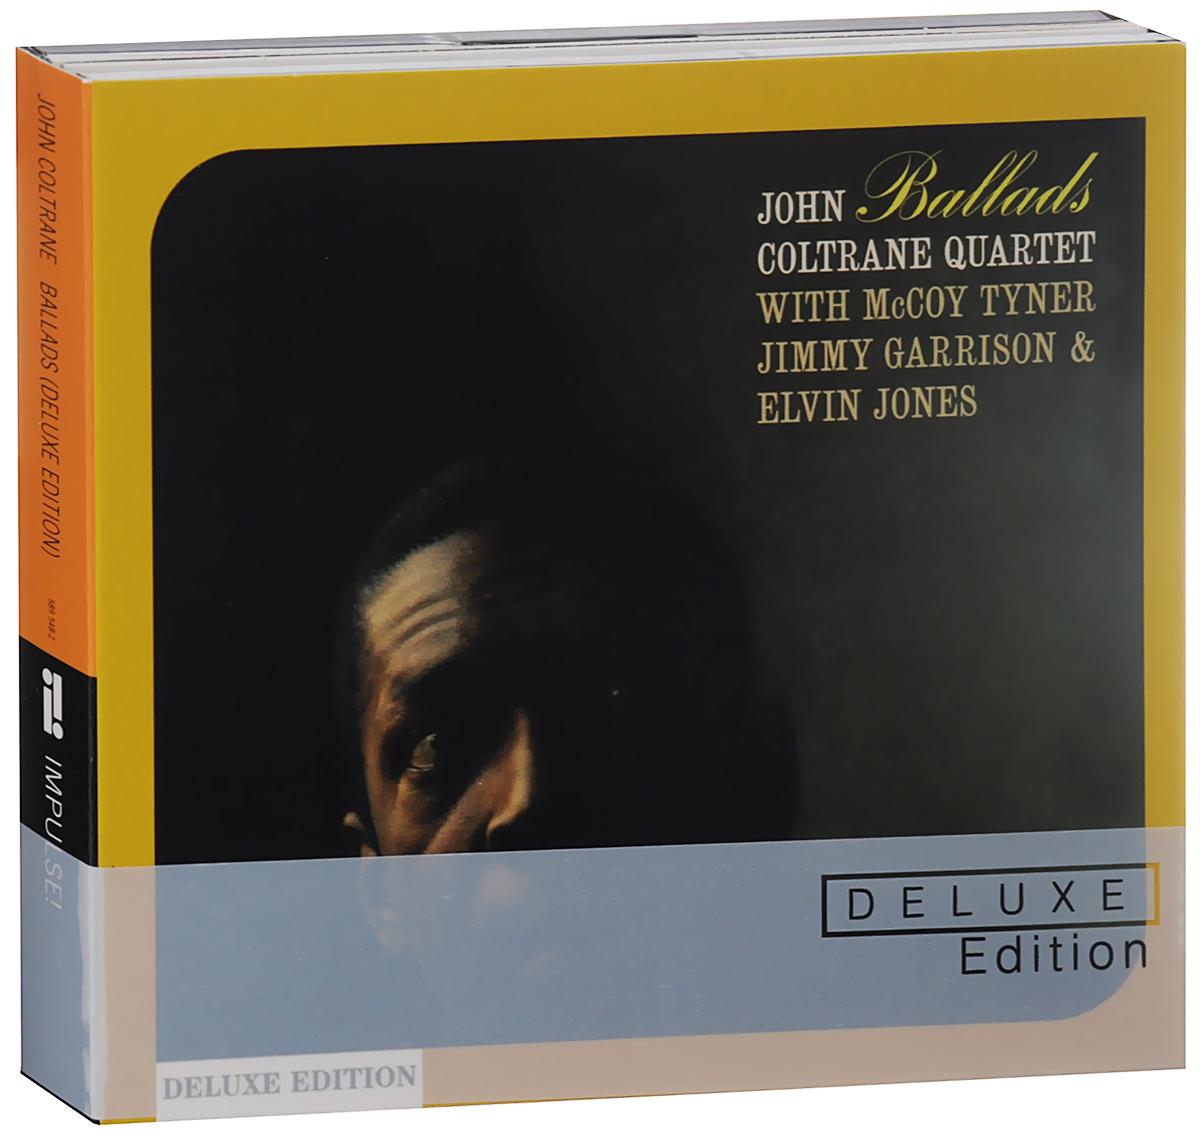 Джон Колтрейн John Coltrane. Ballads. Deluxe Edition (2 CD) джон колтрейн john coltrane giant steps the best of the early years 10 cd